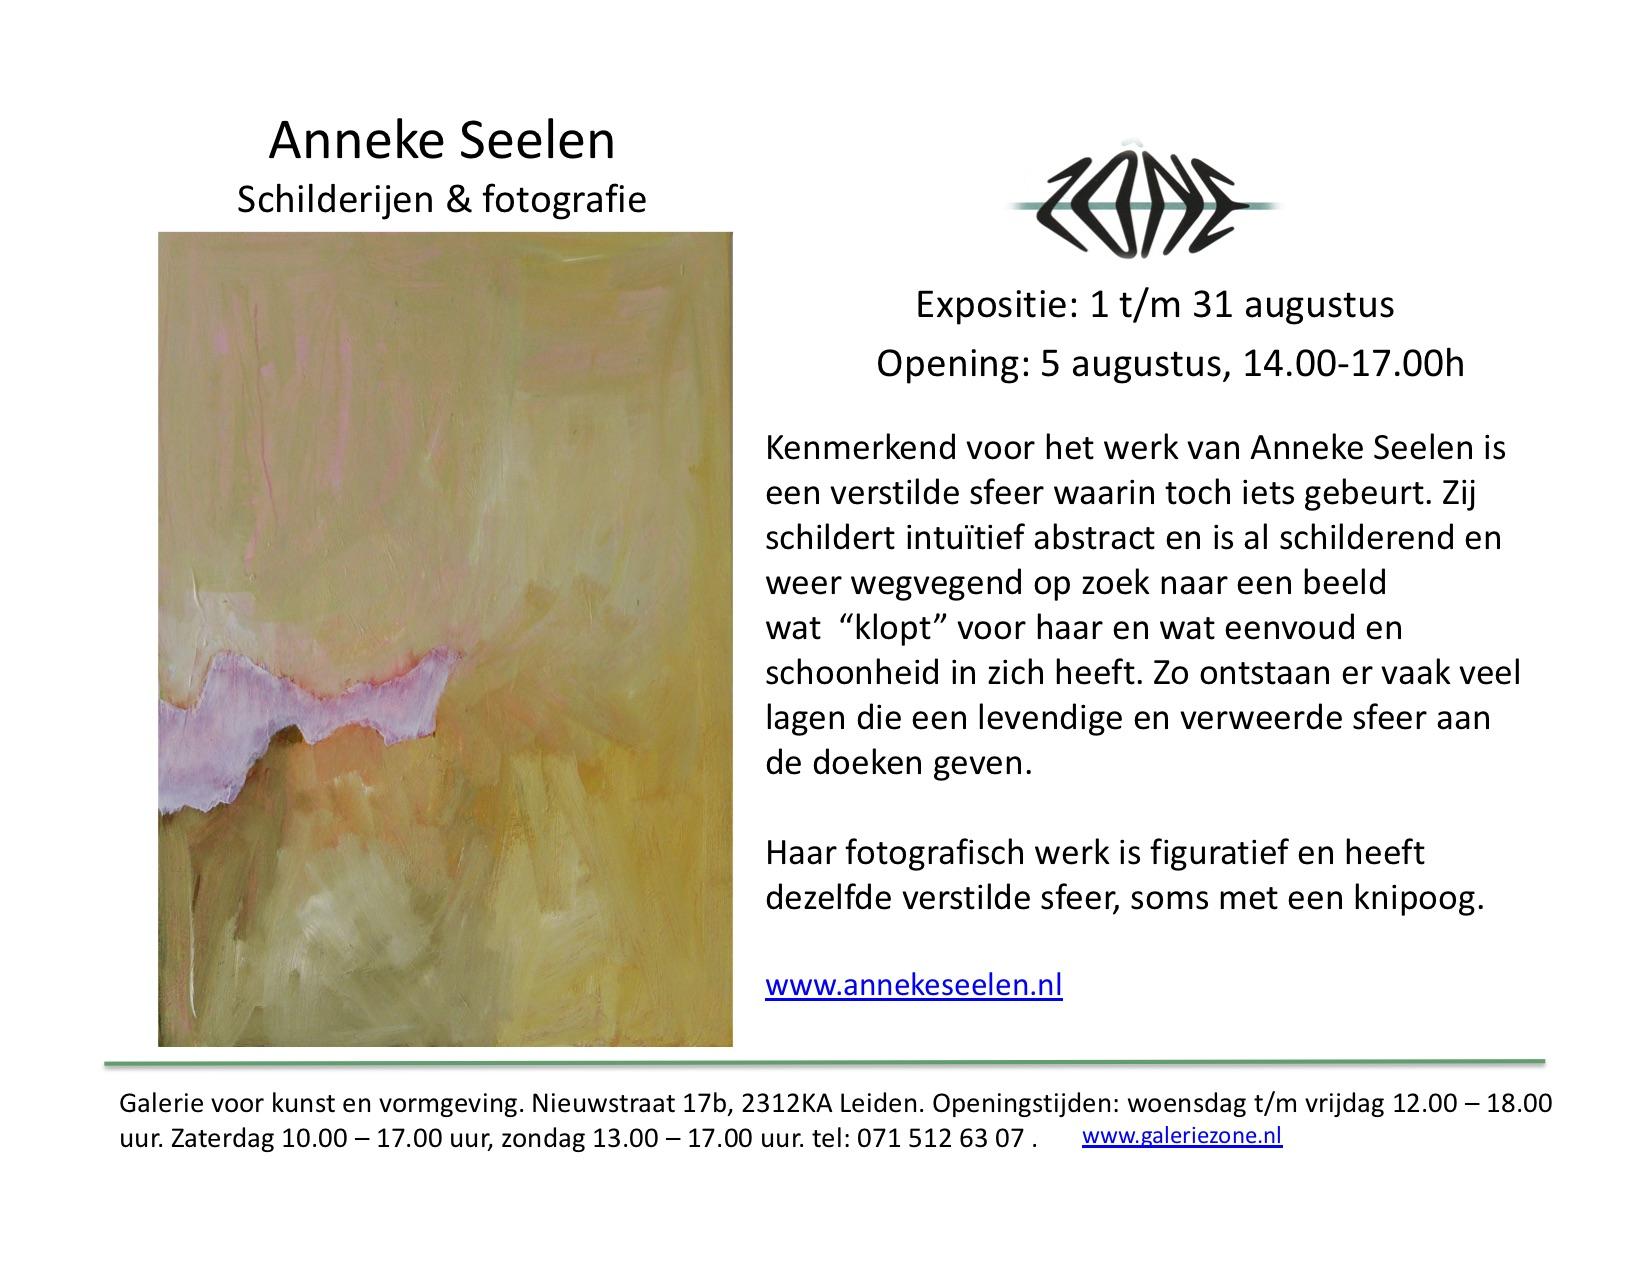 uitnodiging Anneke Seelen